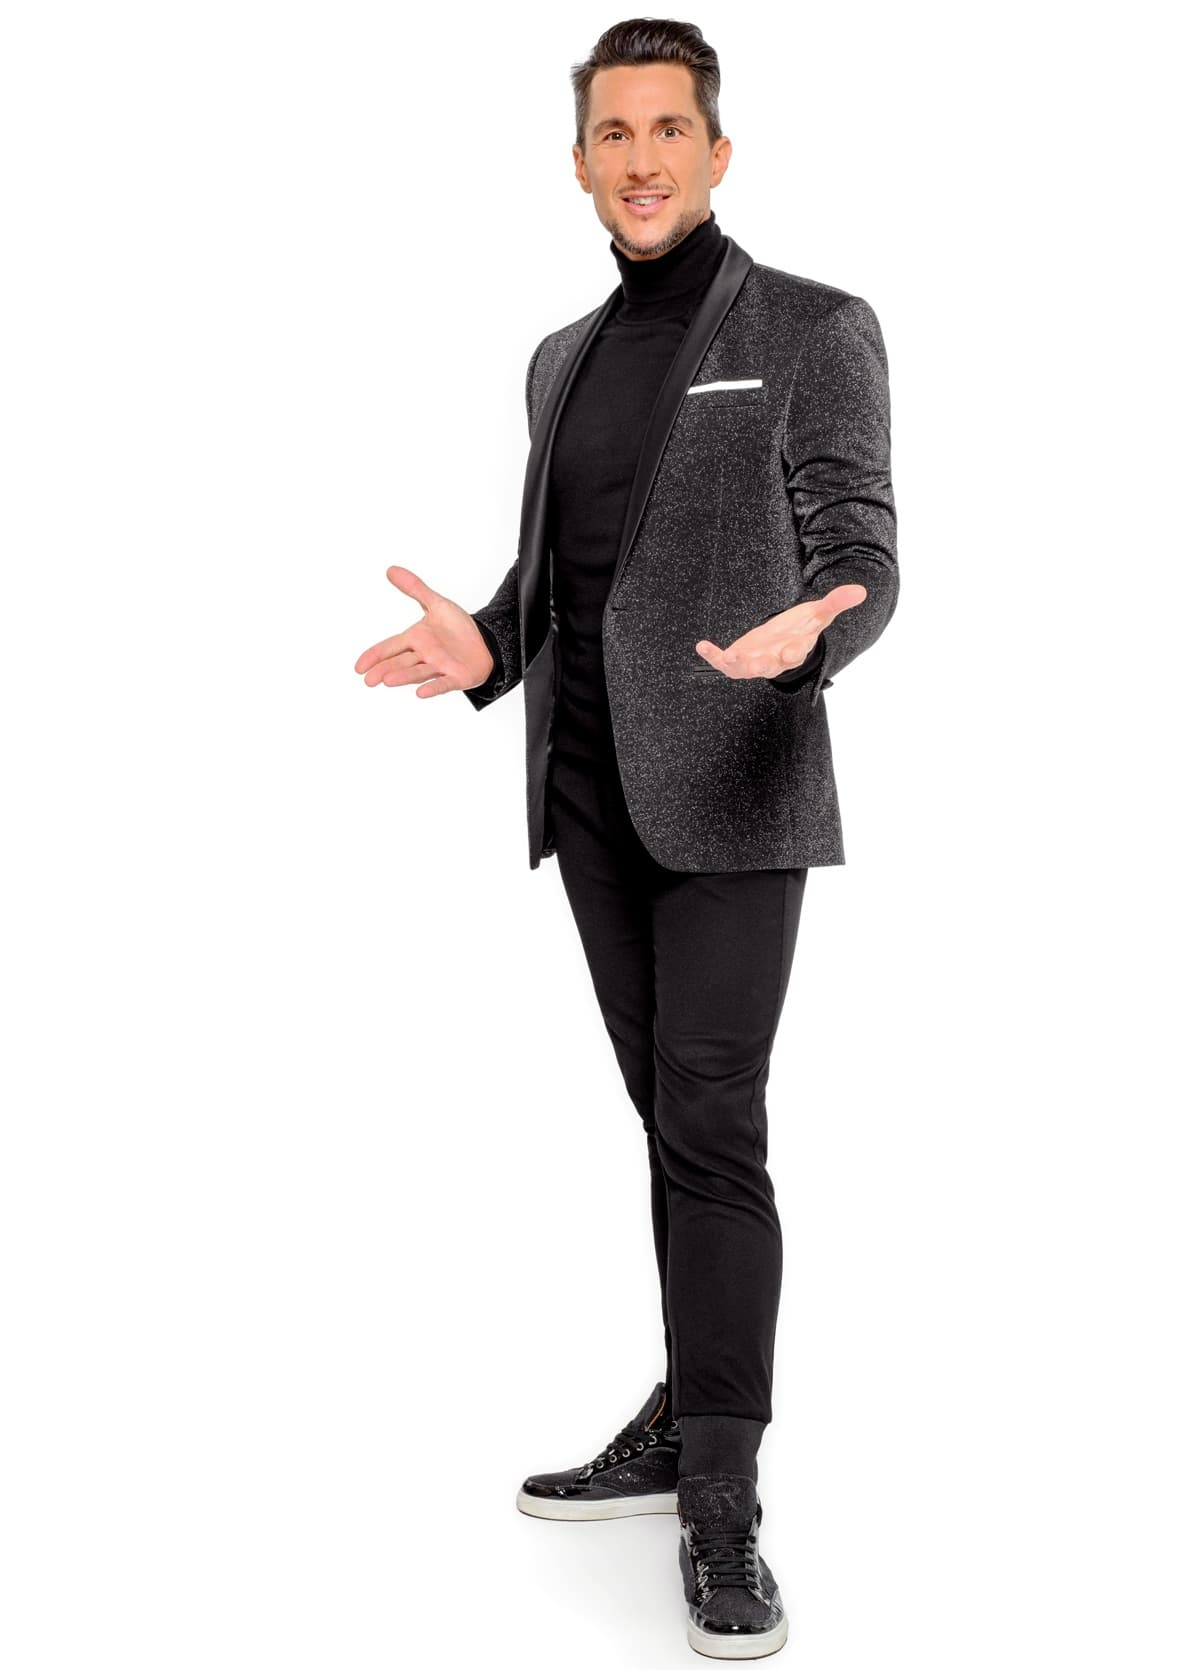 Balazs Ekker in der Jury Dancing Stars 2019